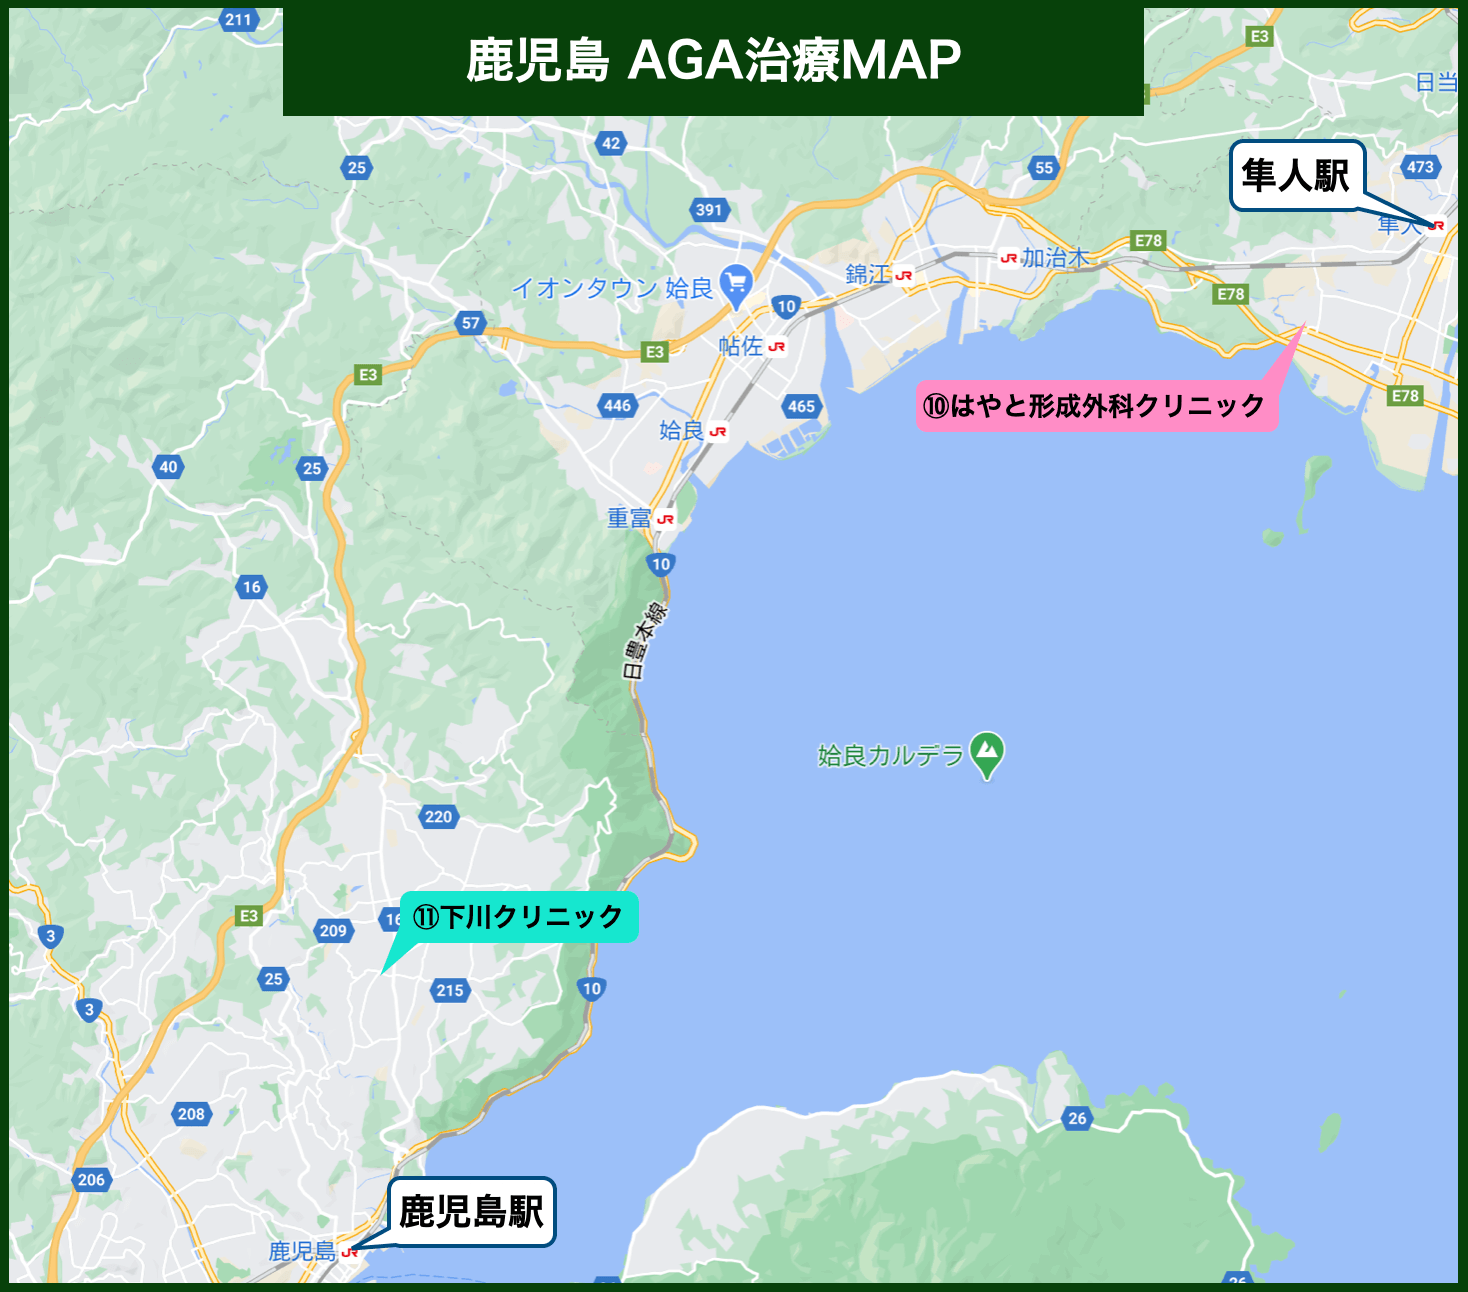 鹿児島 AGA治療MAP